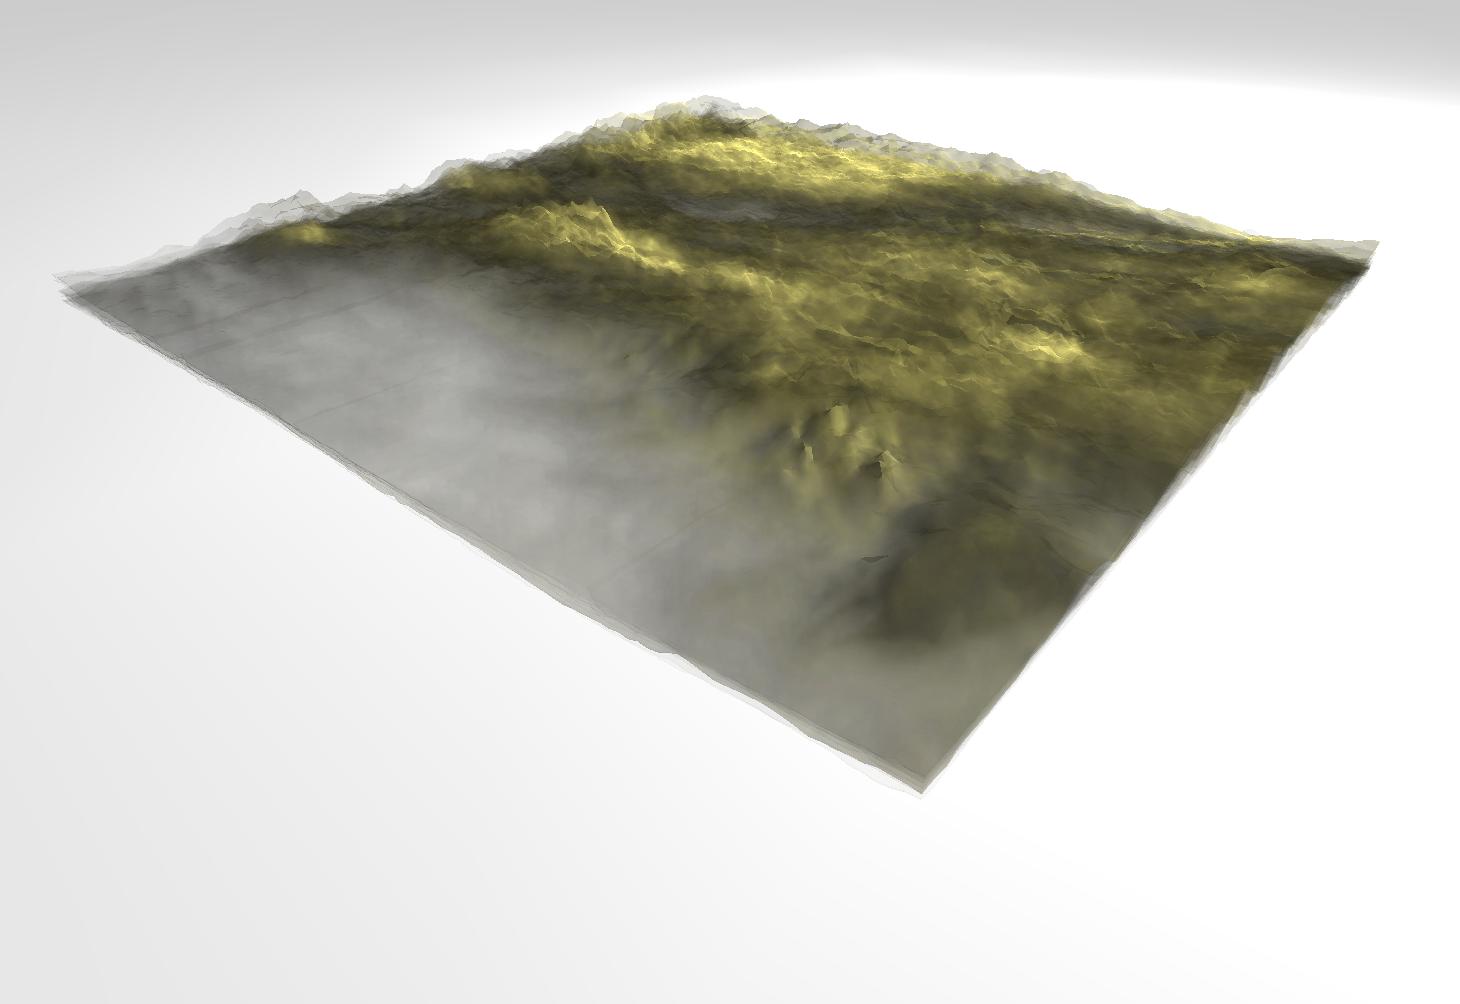 Nanoessence image